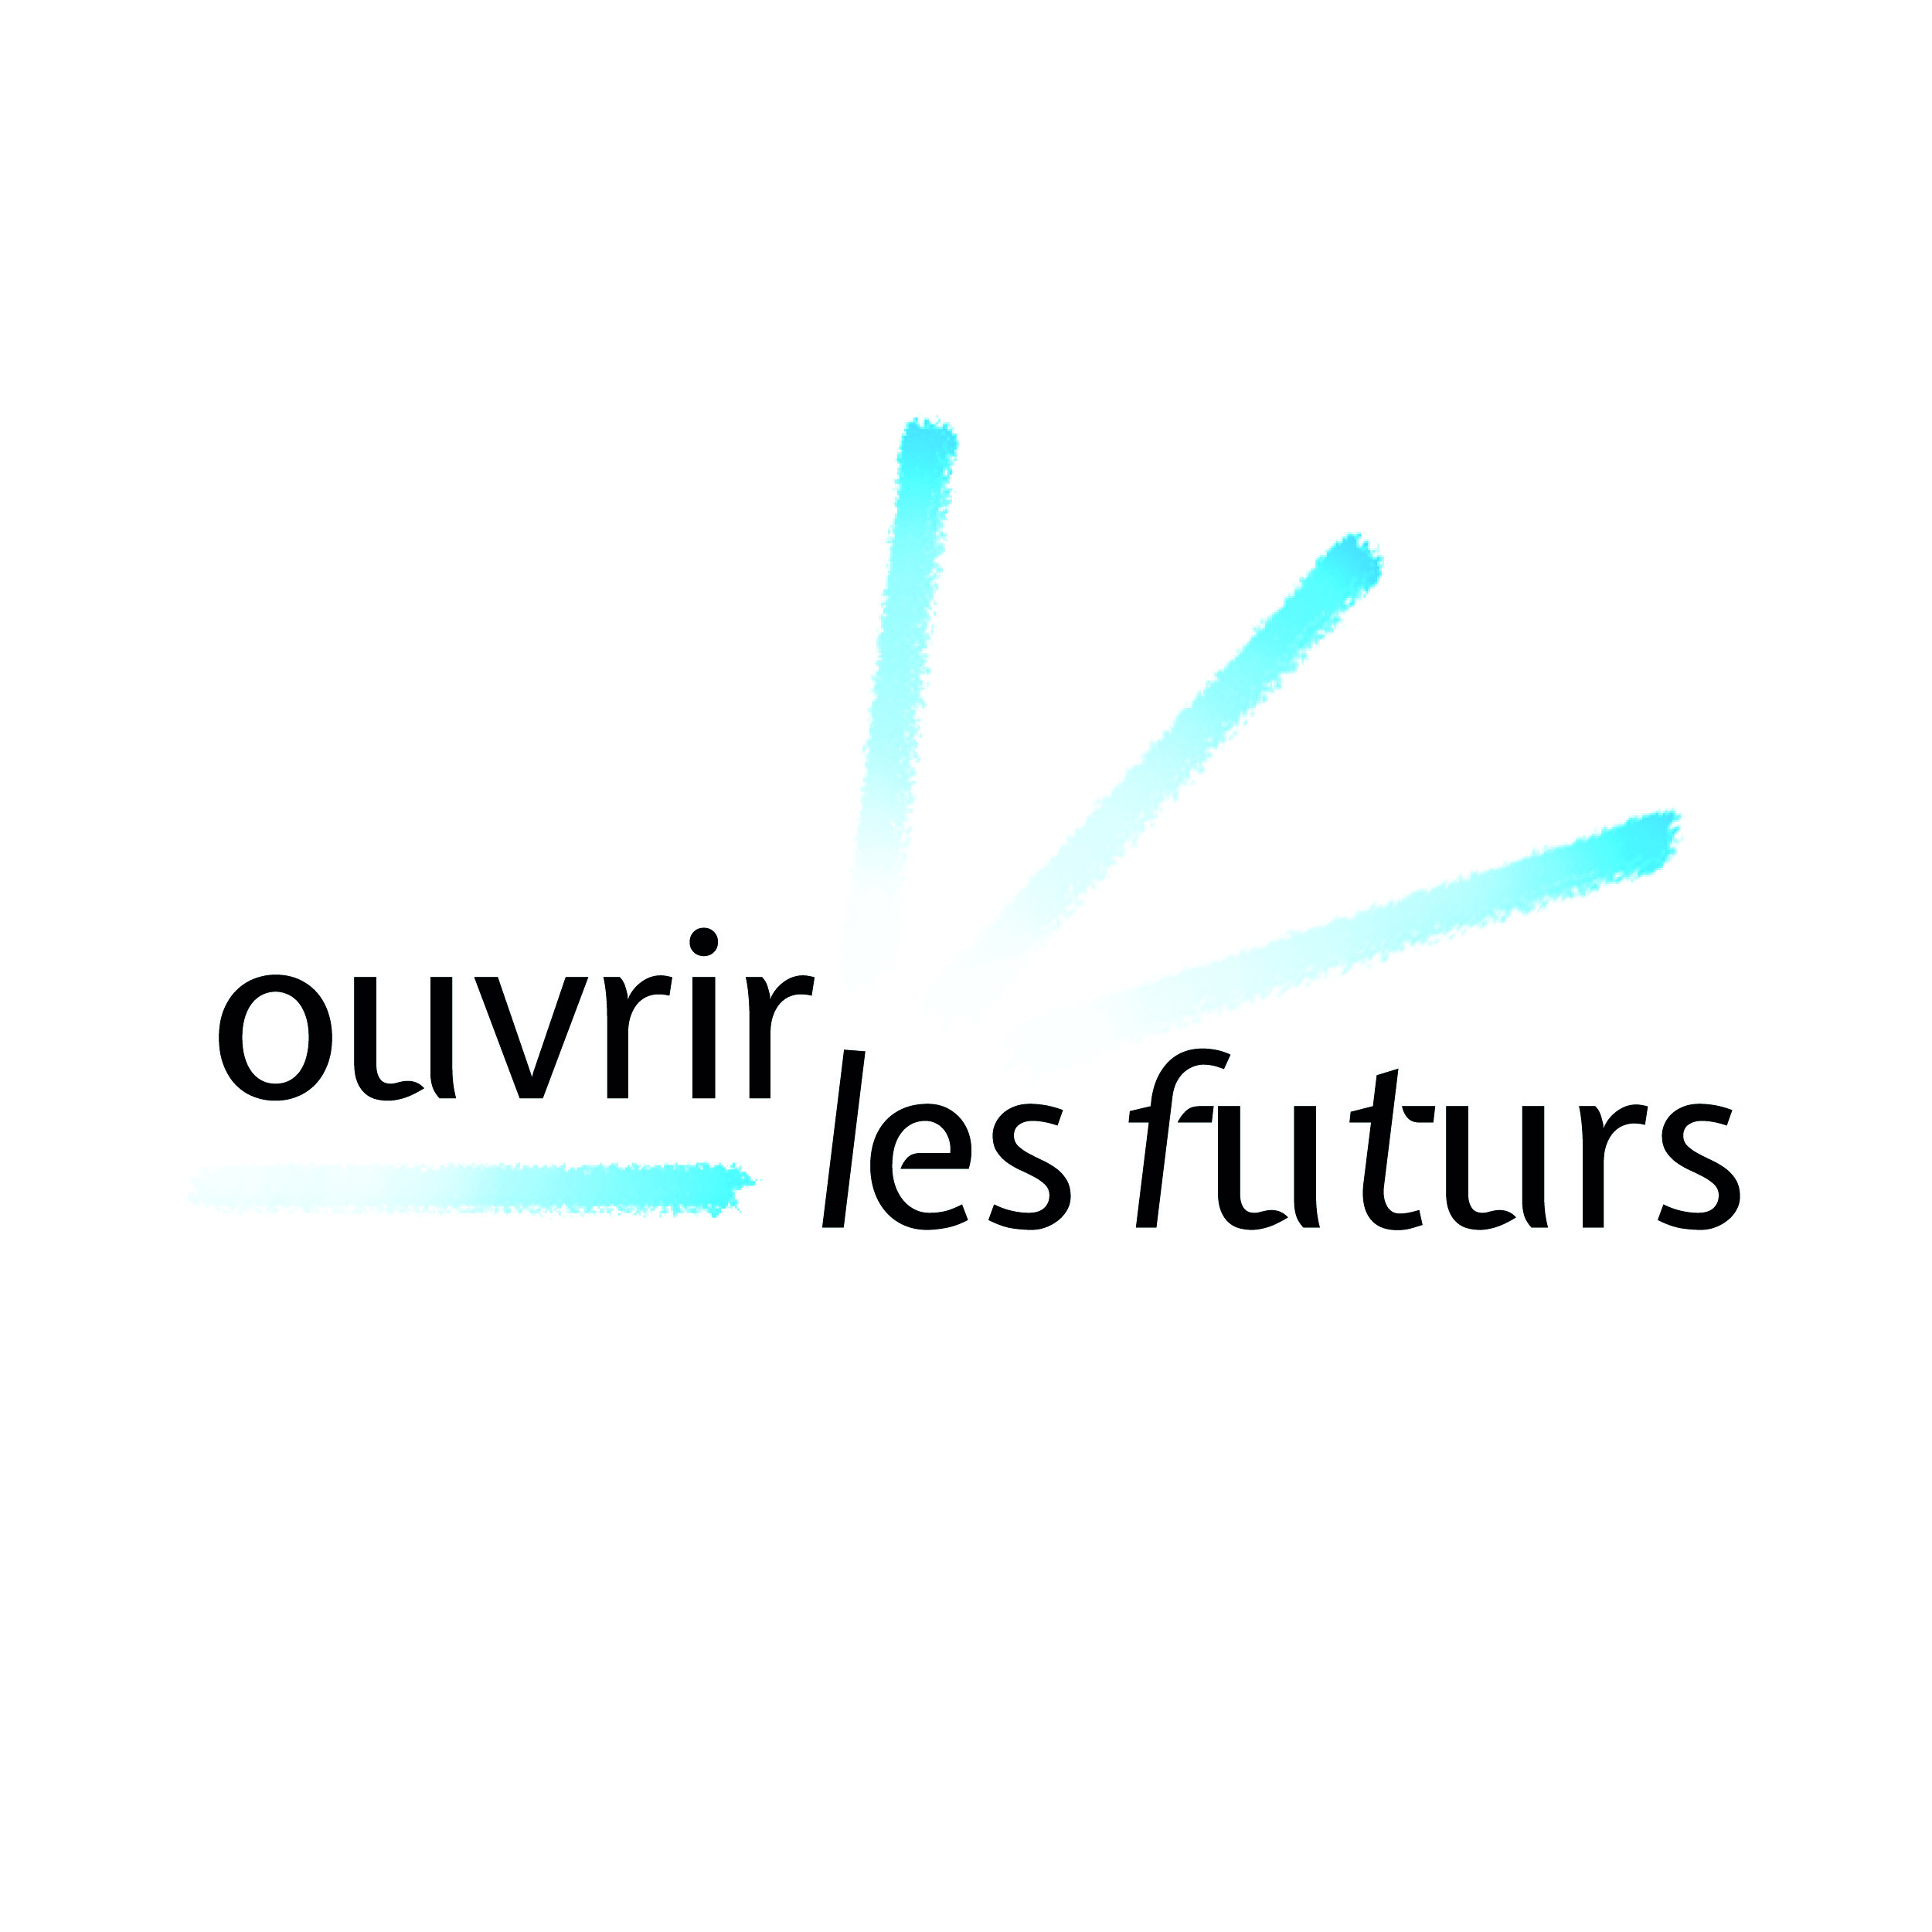 Logo Ouvrir les futurs